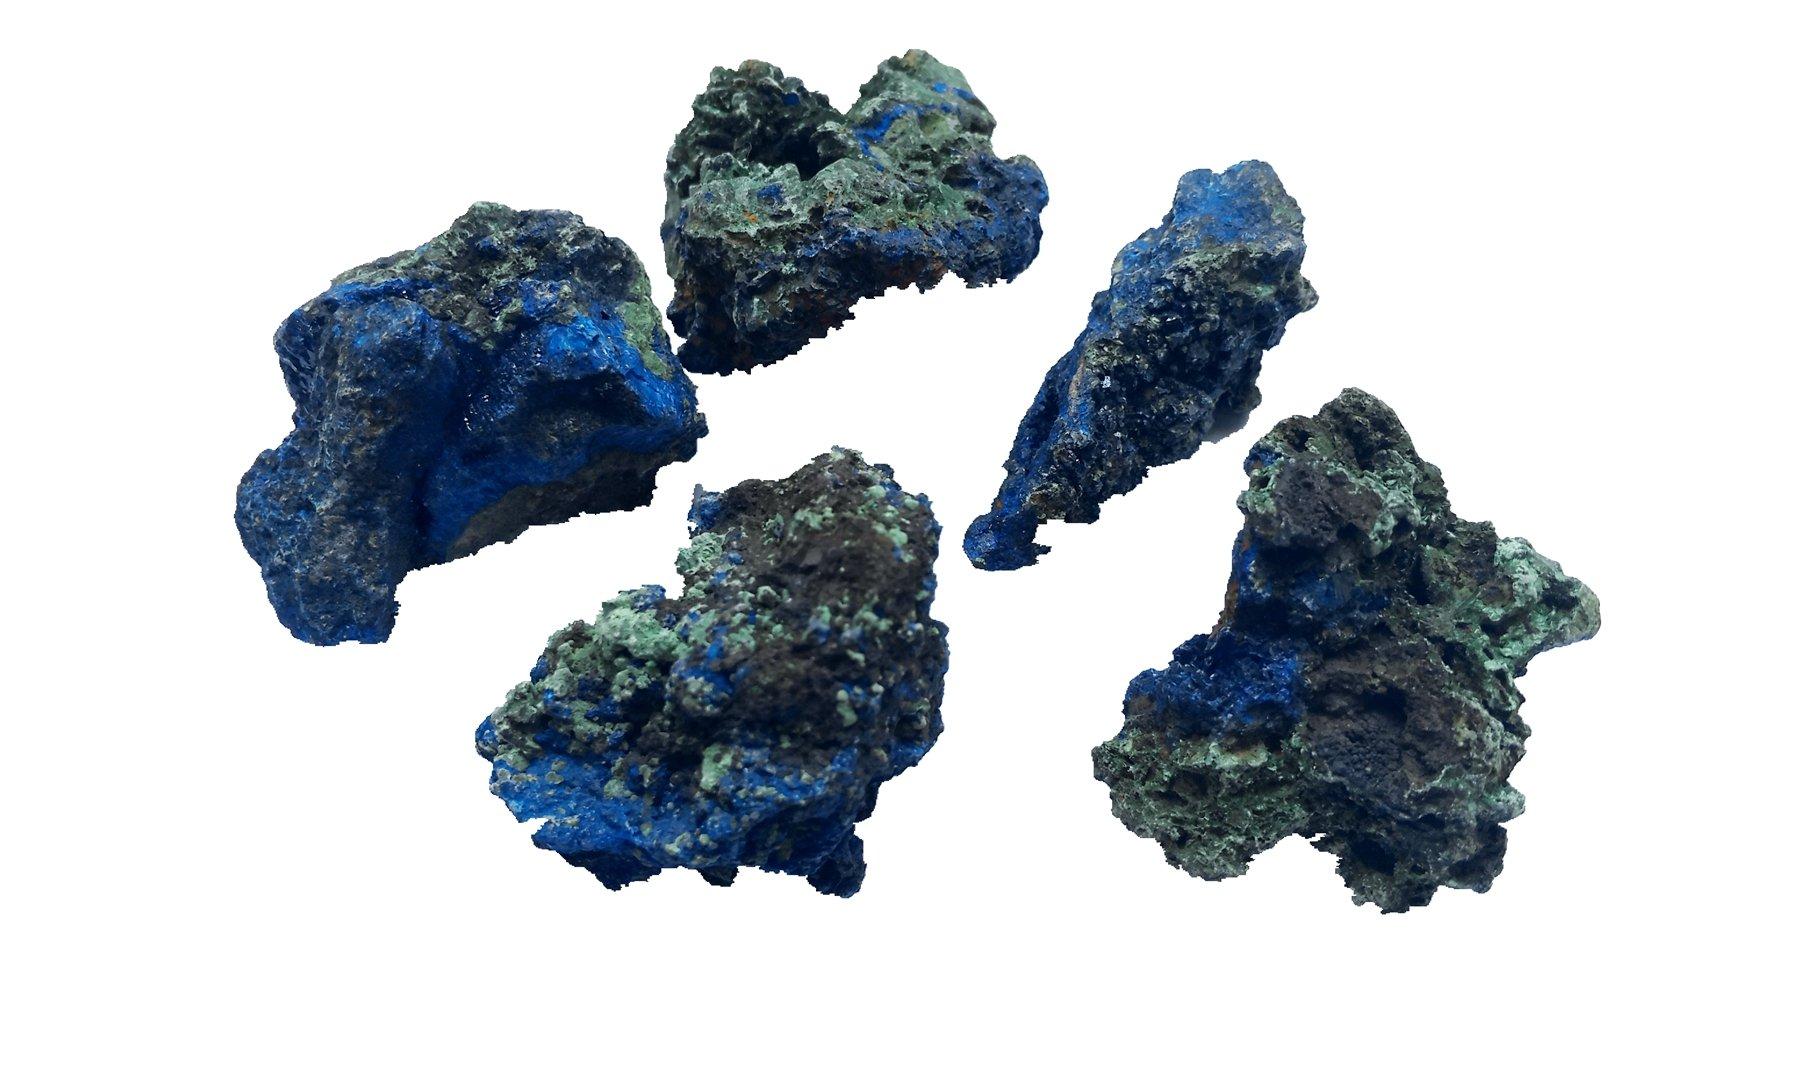 "Beadiy-Natural Azurite Malachite Healing Crystal 1/2 Ib Healing Chakra,Mineral Specimens,Large Approx 1""-2.2"""